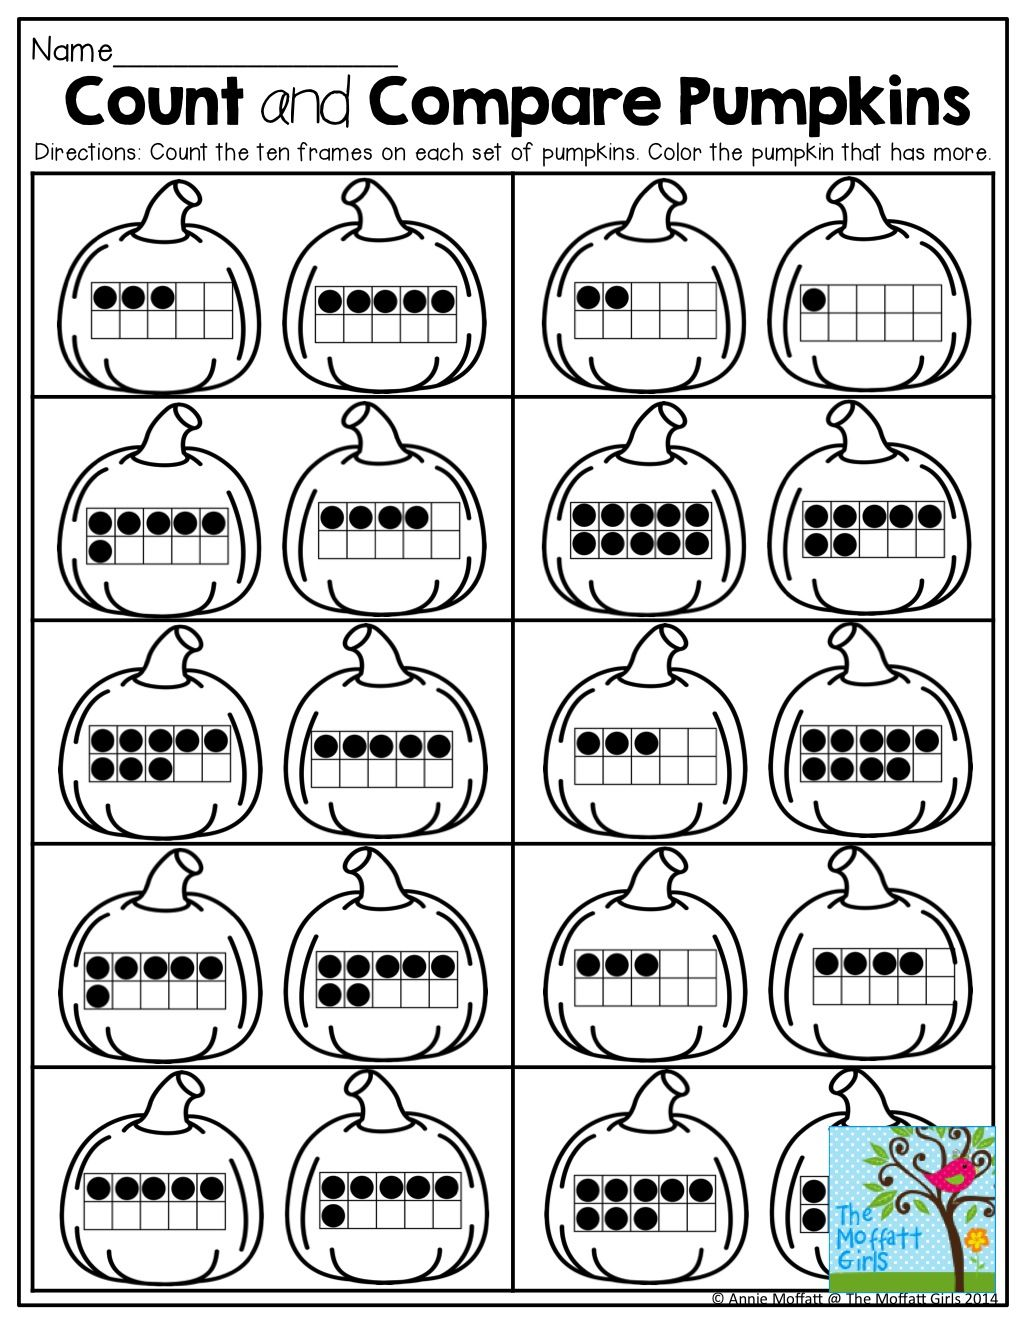 Pin by Kelsie Peachey on Math | Pinterest | Ten frames, Count and Math